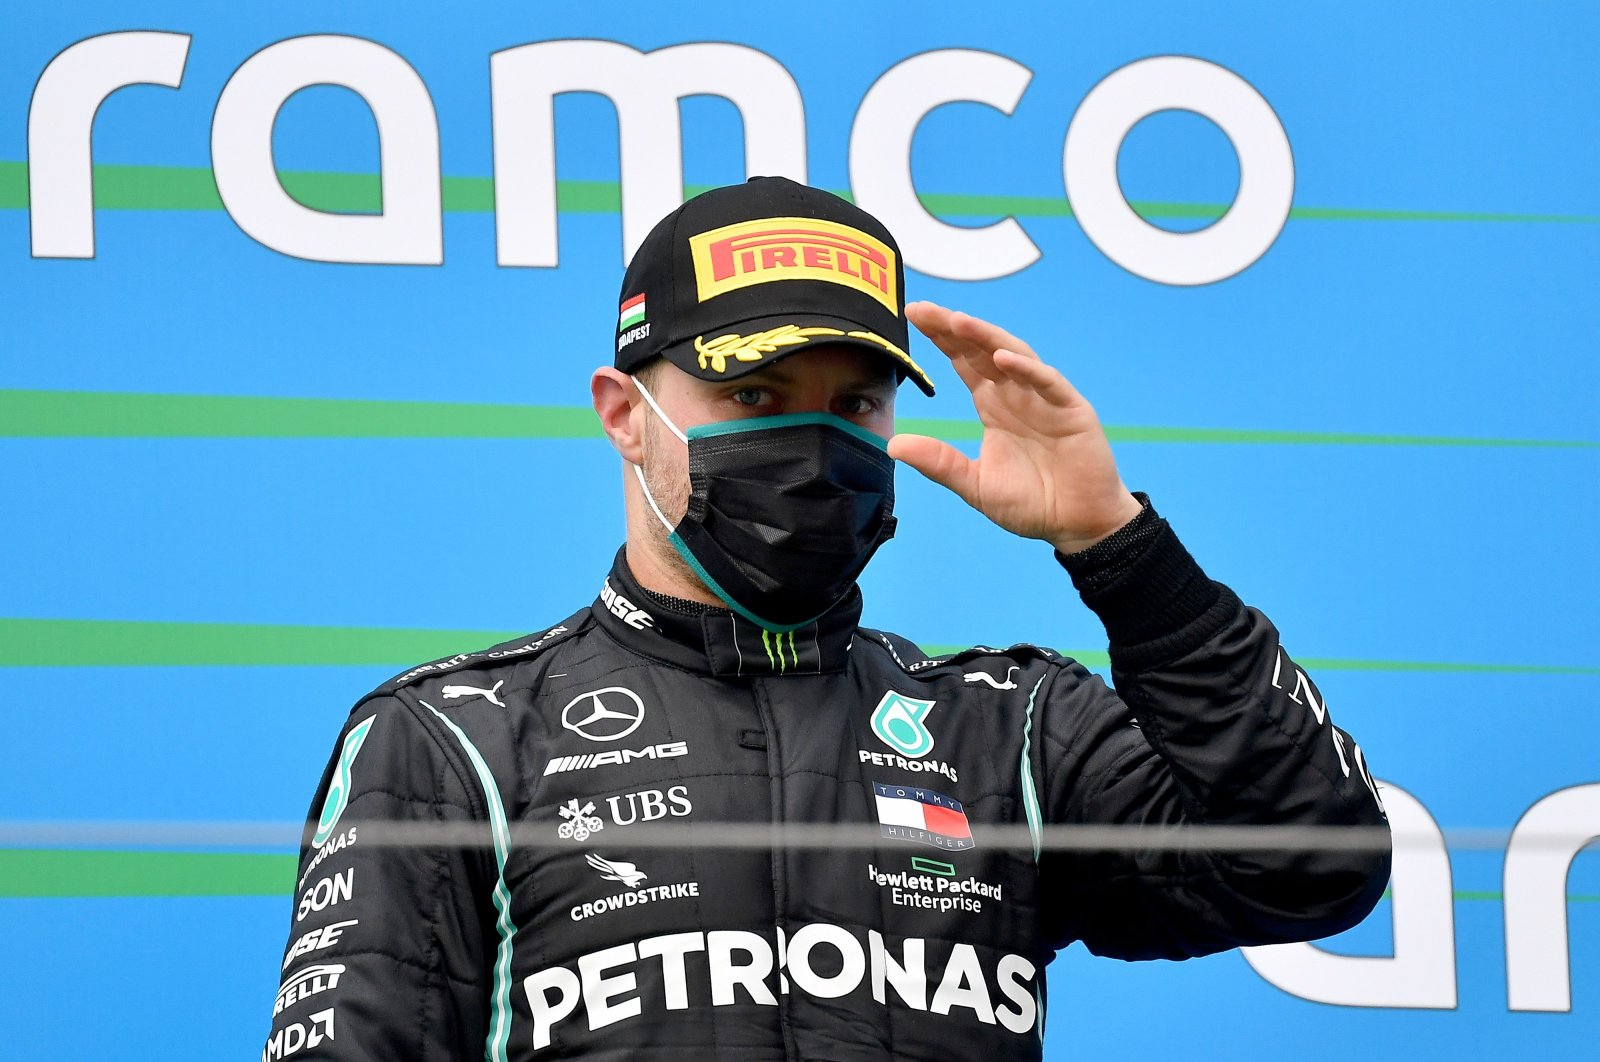 Mercedes driver Valtteri Bottas gestures on the podium after the Formula 1 Hungarian Grand Prix race in Mogyorod, Hungary, July 19, 2020. (AFP Photo)